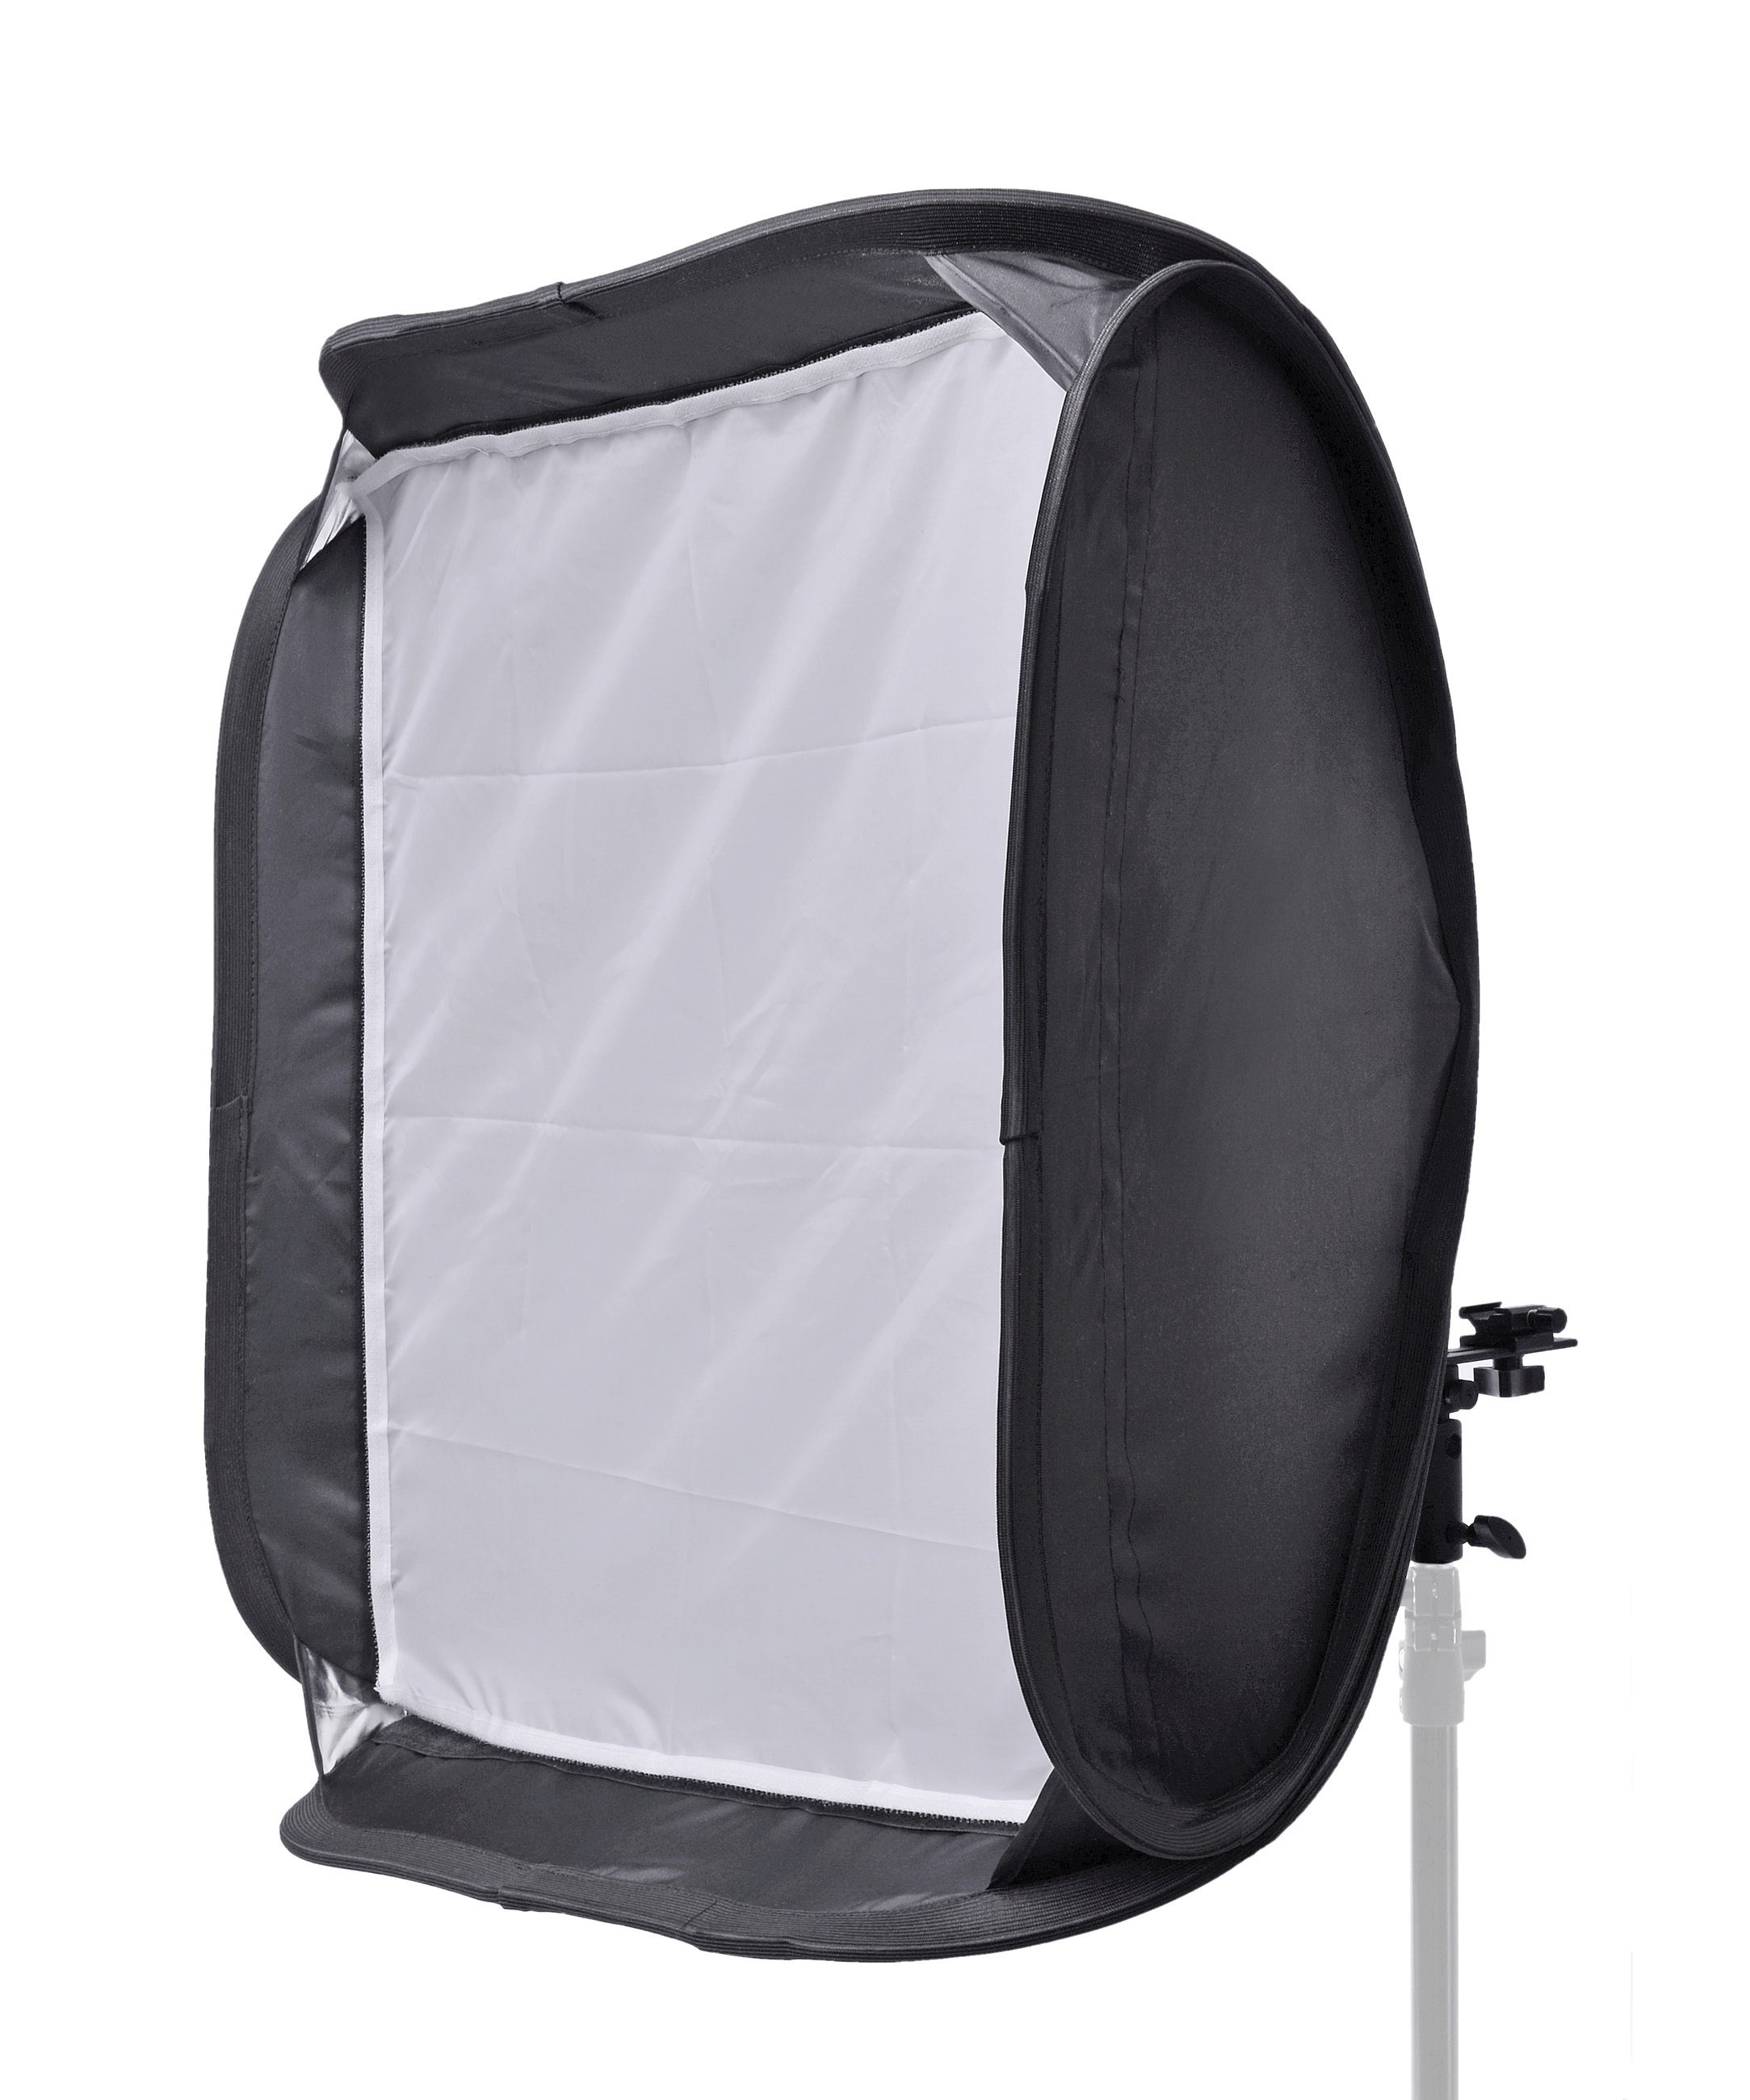 BRESSER Fotostudio »BRESSER SS-14 Kamerablitz-Softbox 60x60cm«